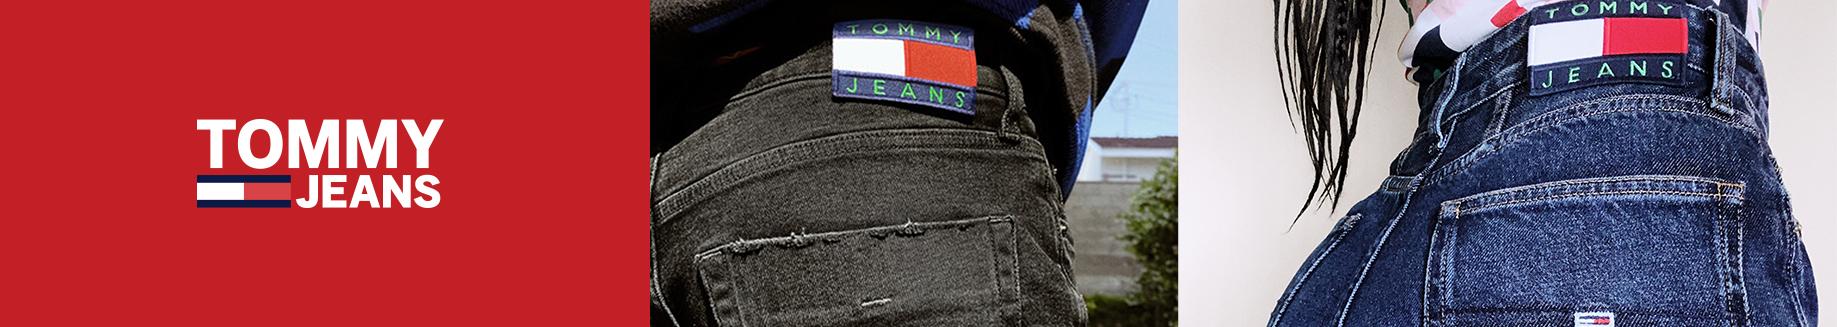 Товары Tommy Jeans для женщин